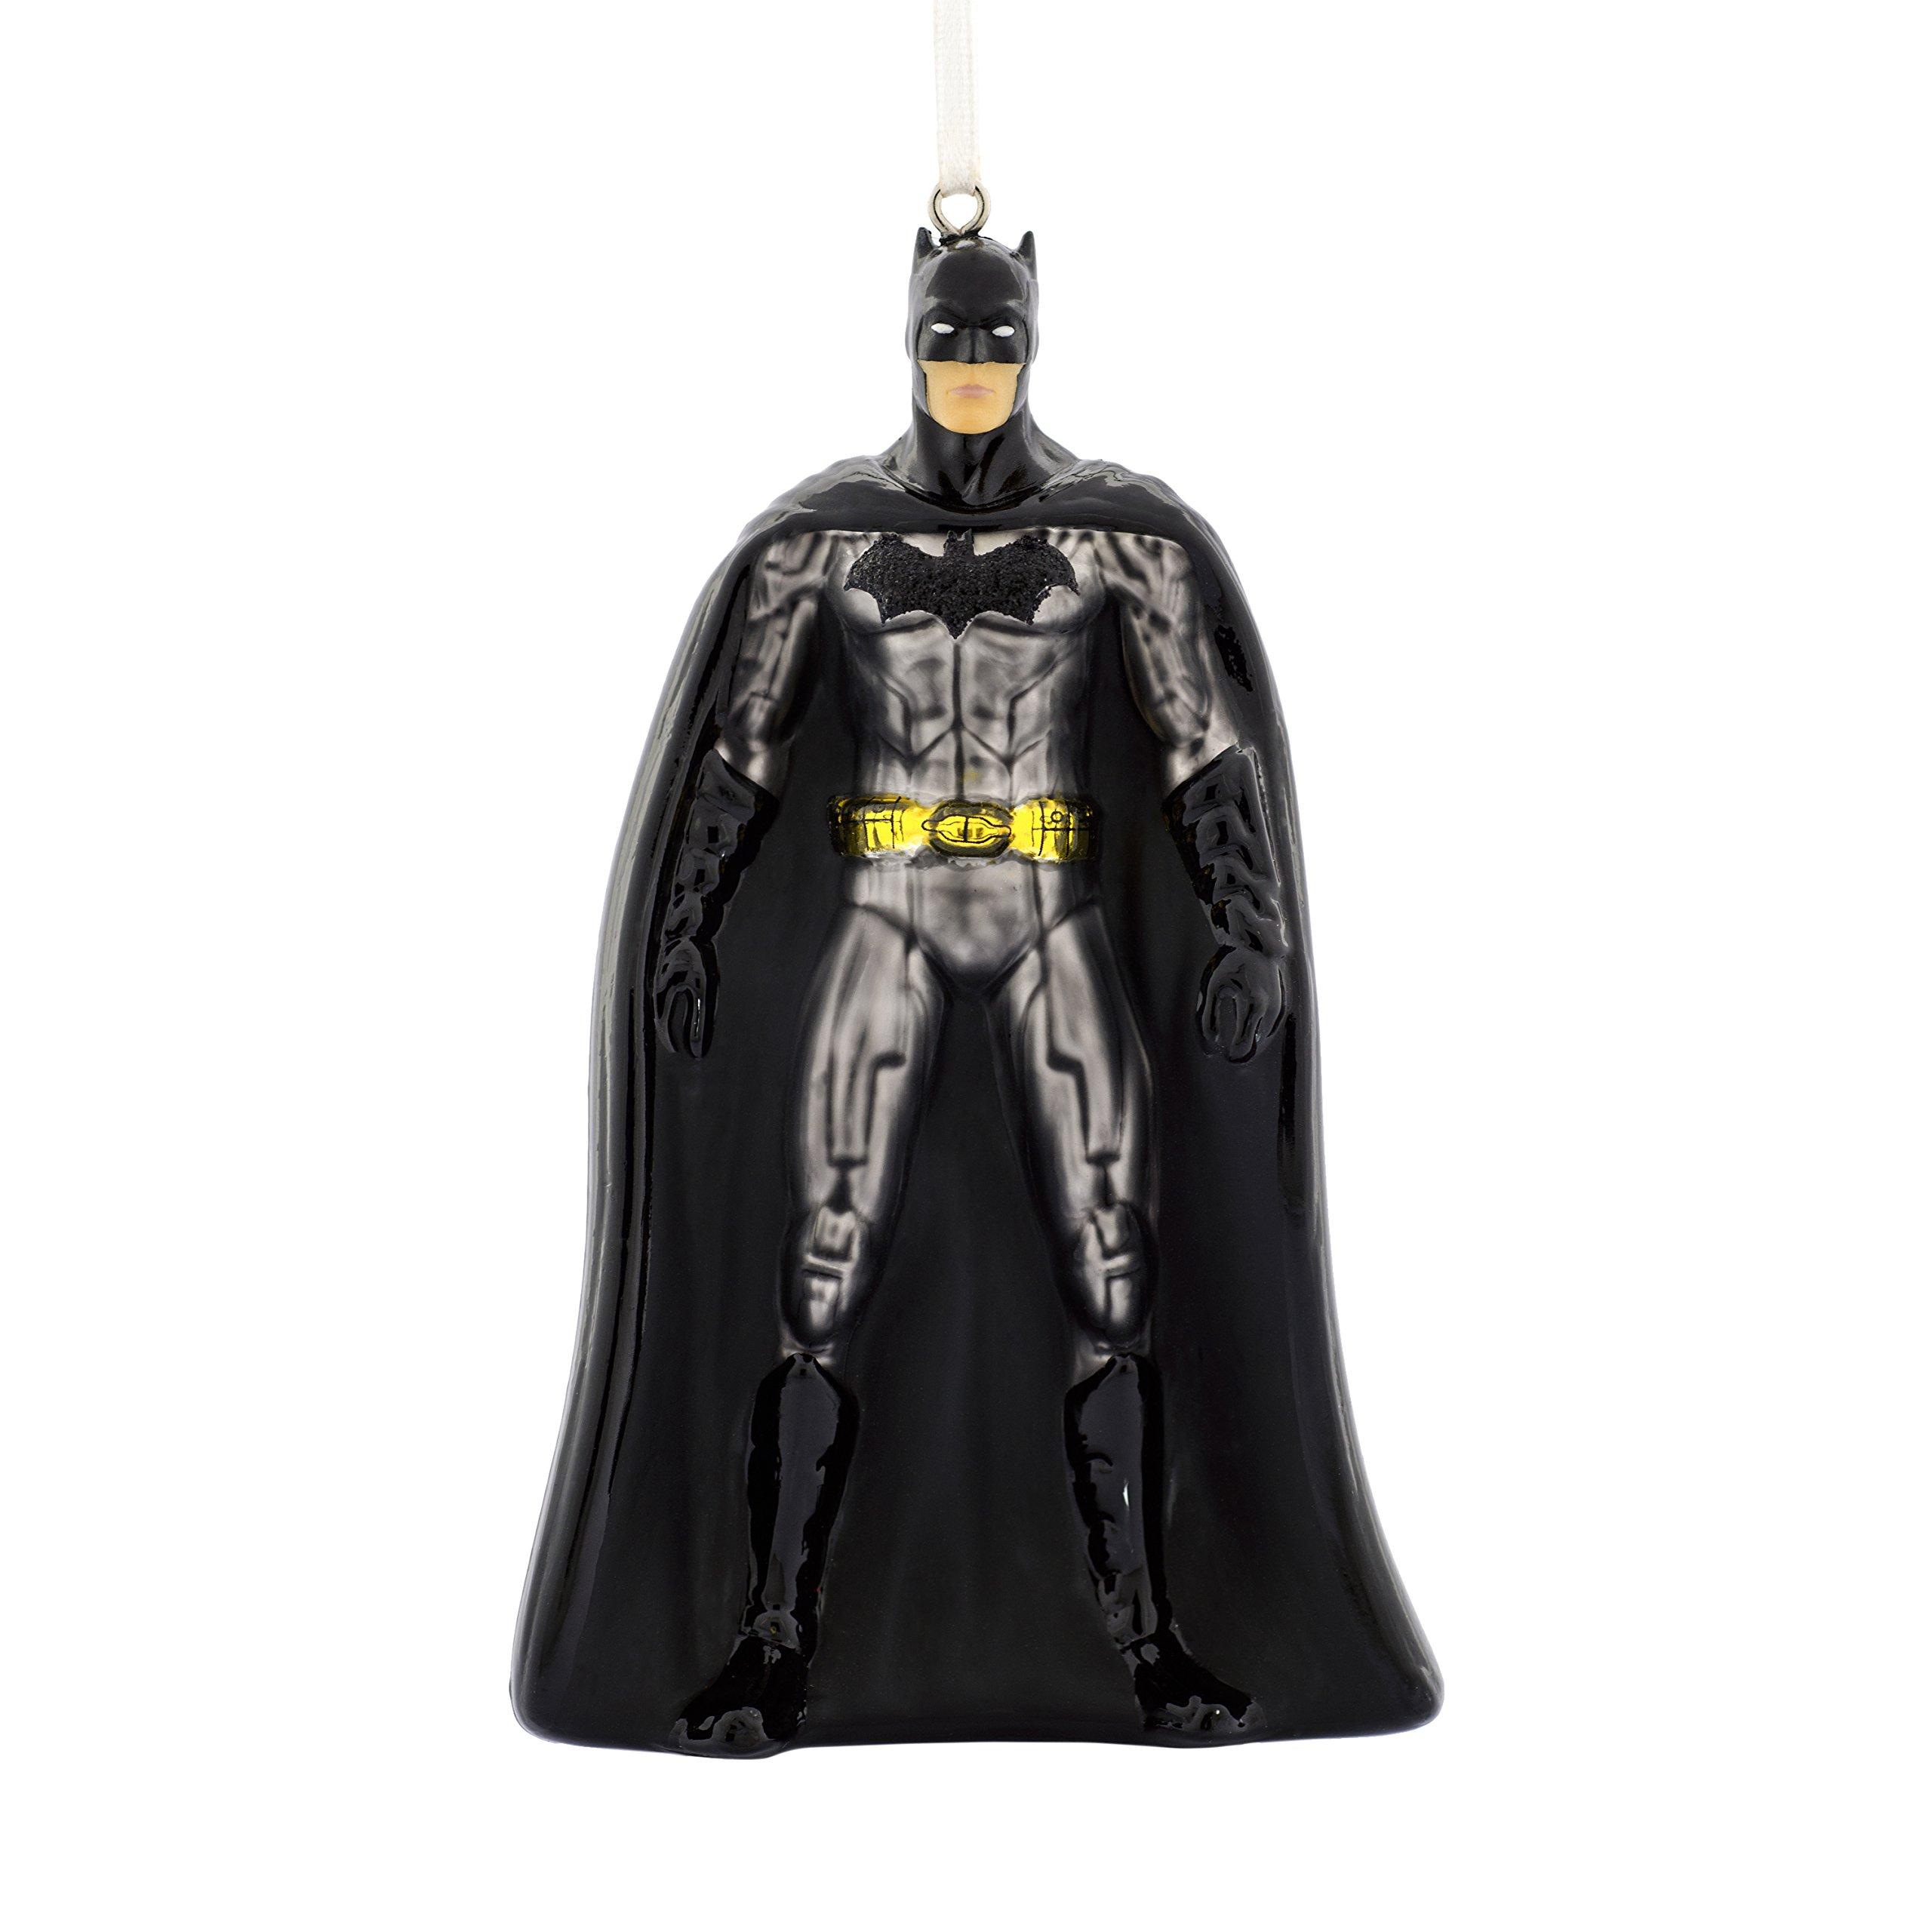 Hallmark Christmas Ornament Batman Blown Glass Figure